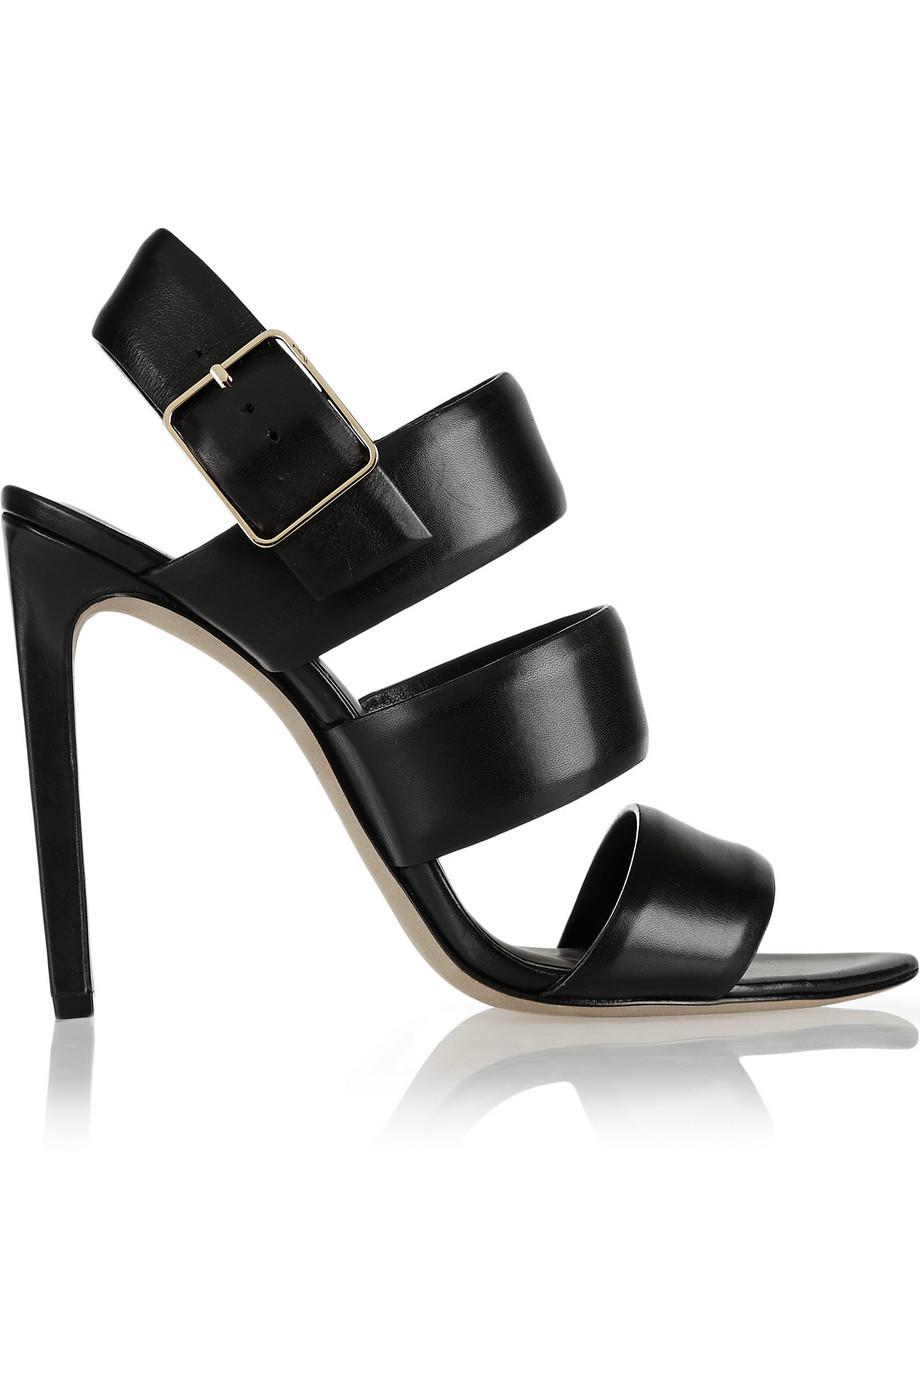 Alexander Wang Kerry sandal heel